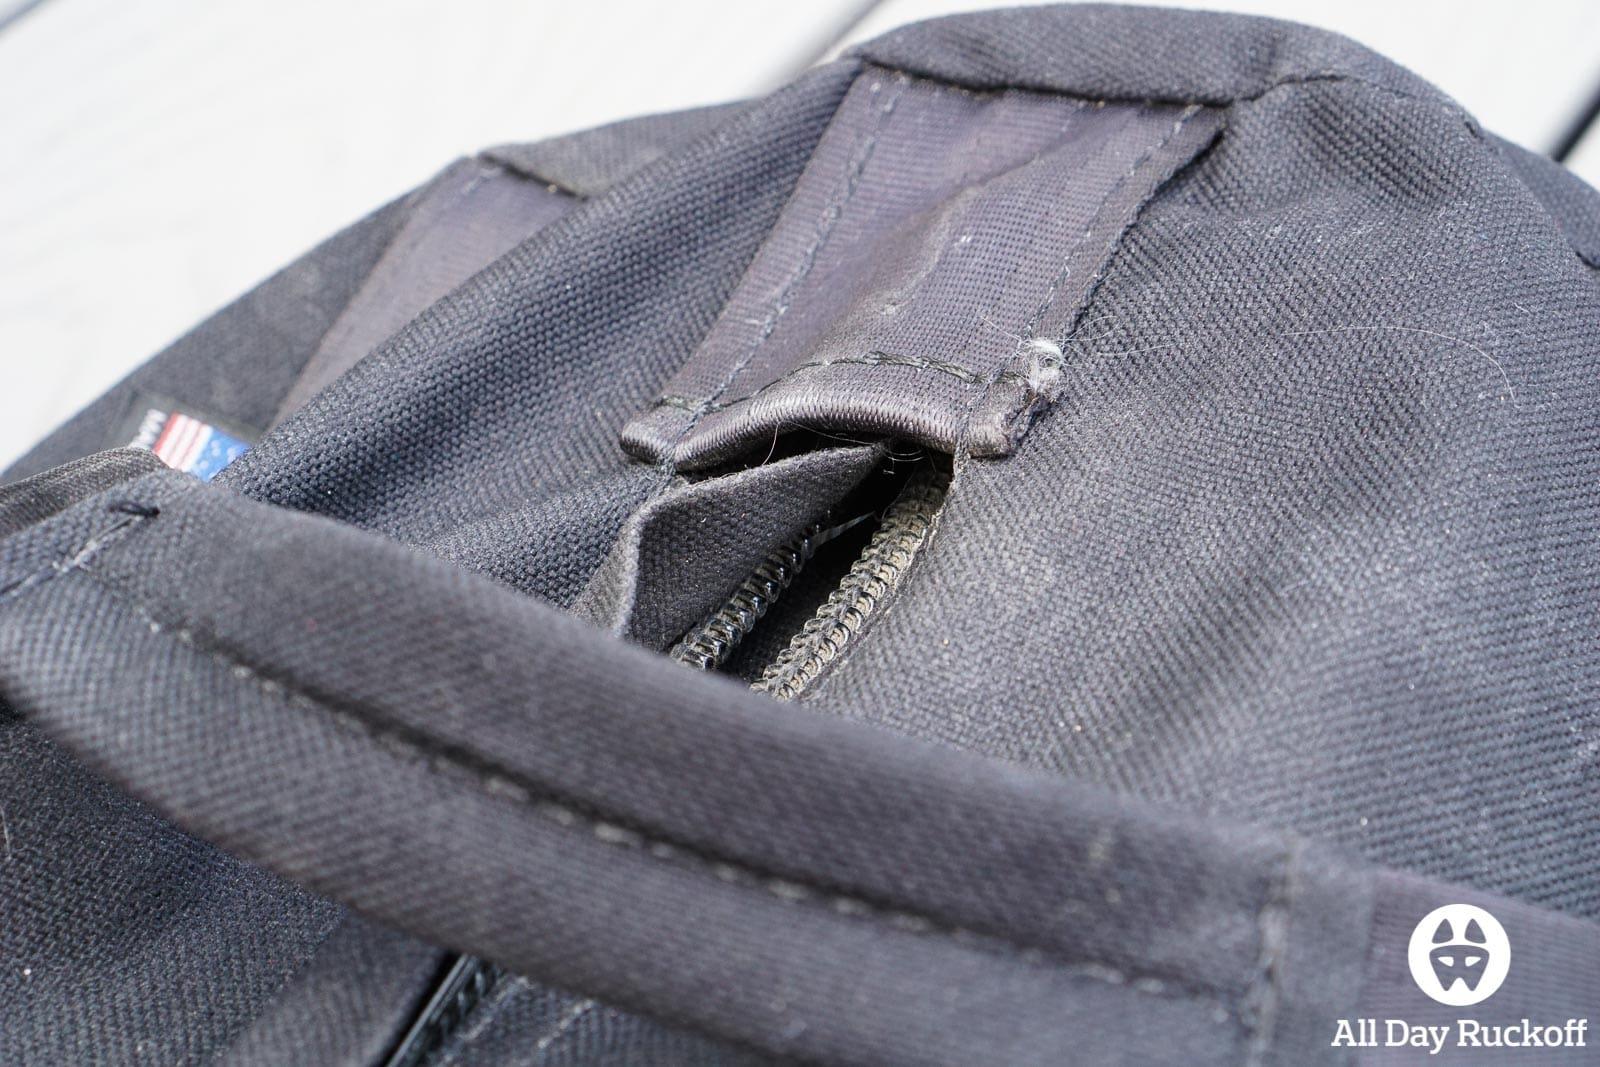 Brute Force Athlete Sandbag - Zipper Pocket Empty